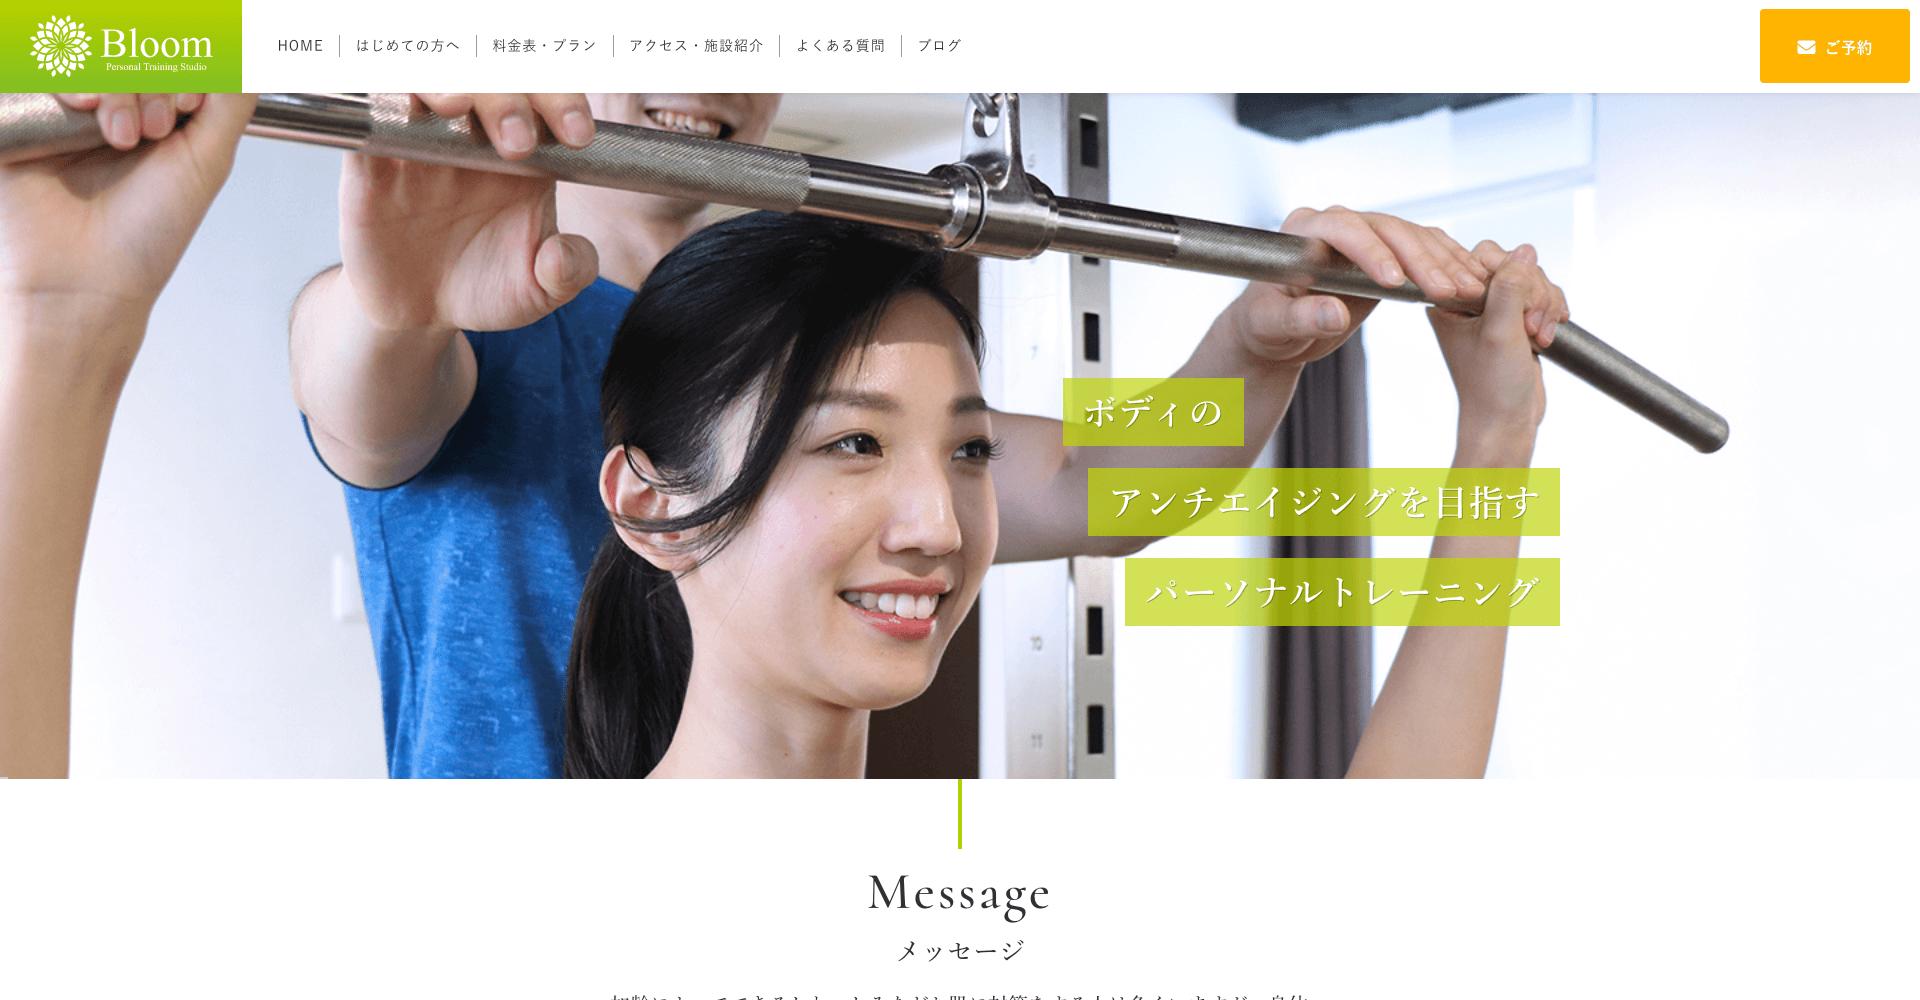 Bloom Personal Training Studio/ブルームパーソナルトレーニングスタジオ